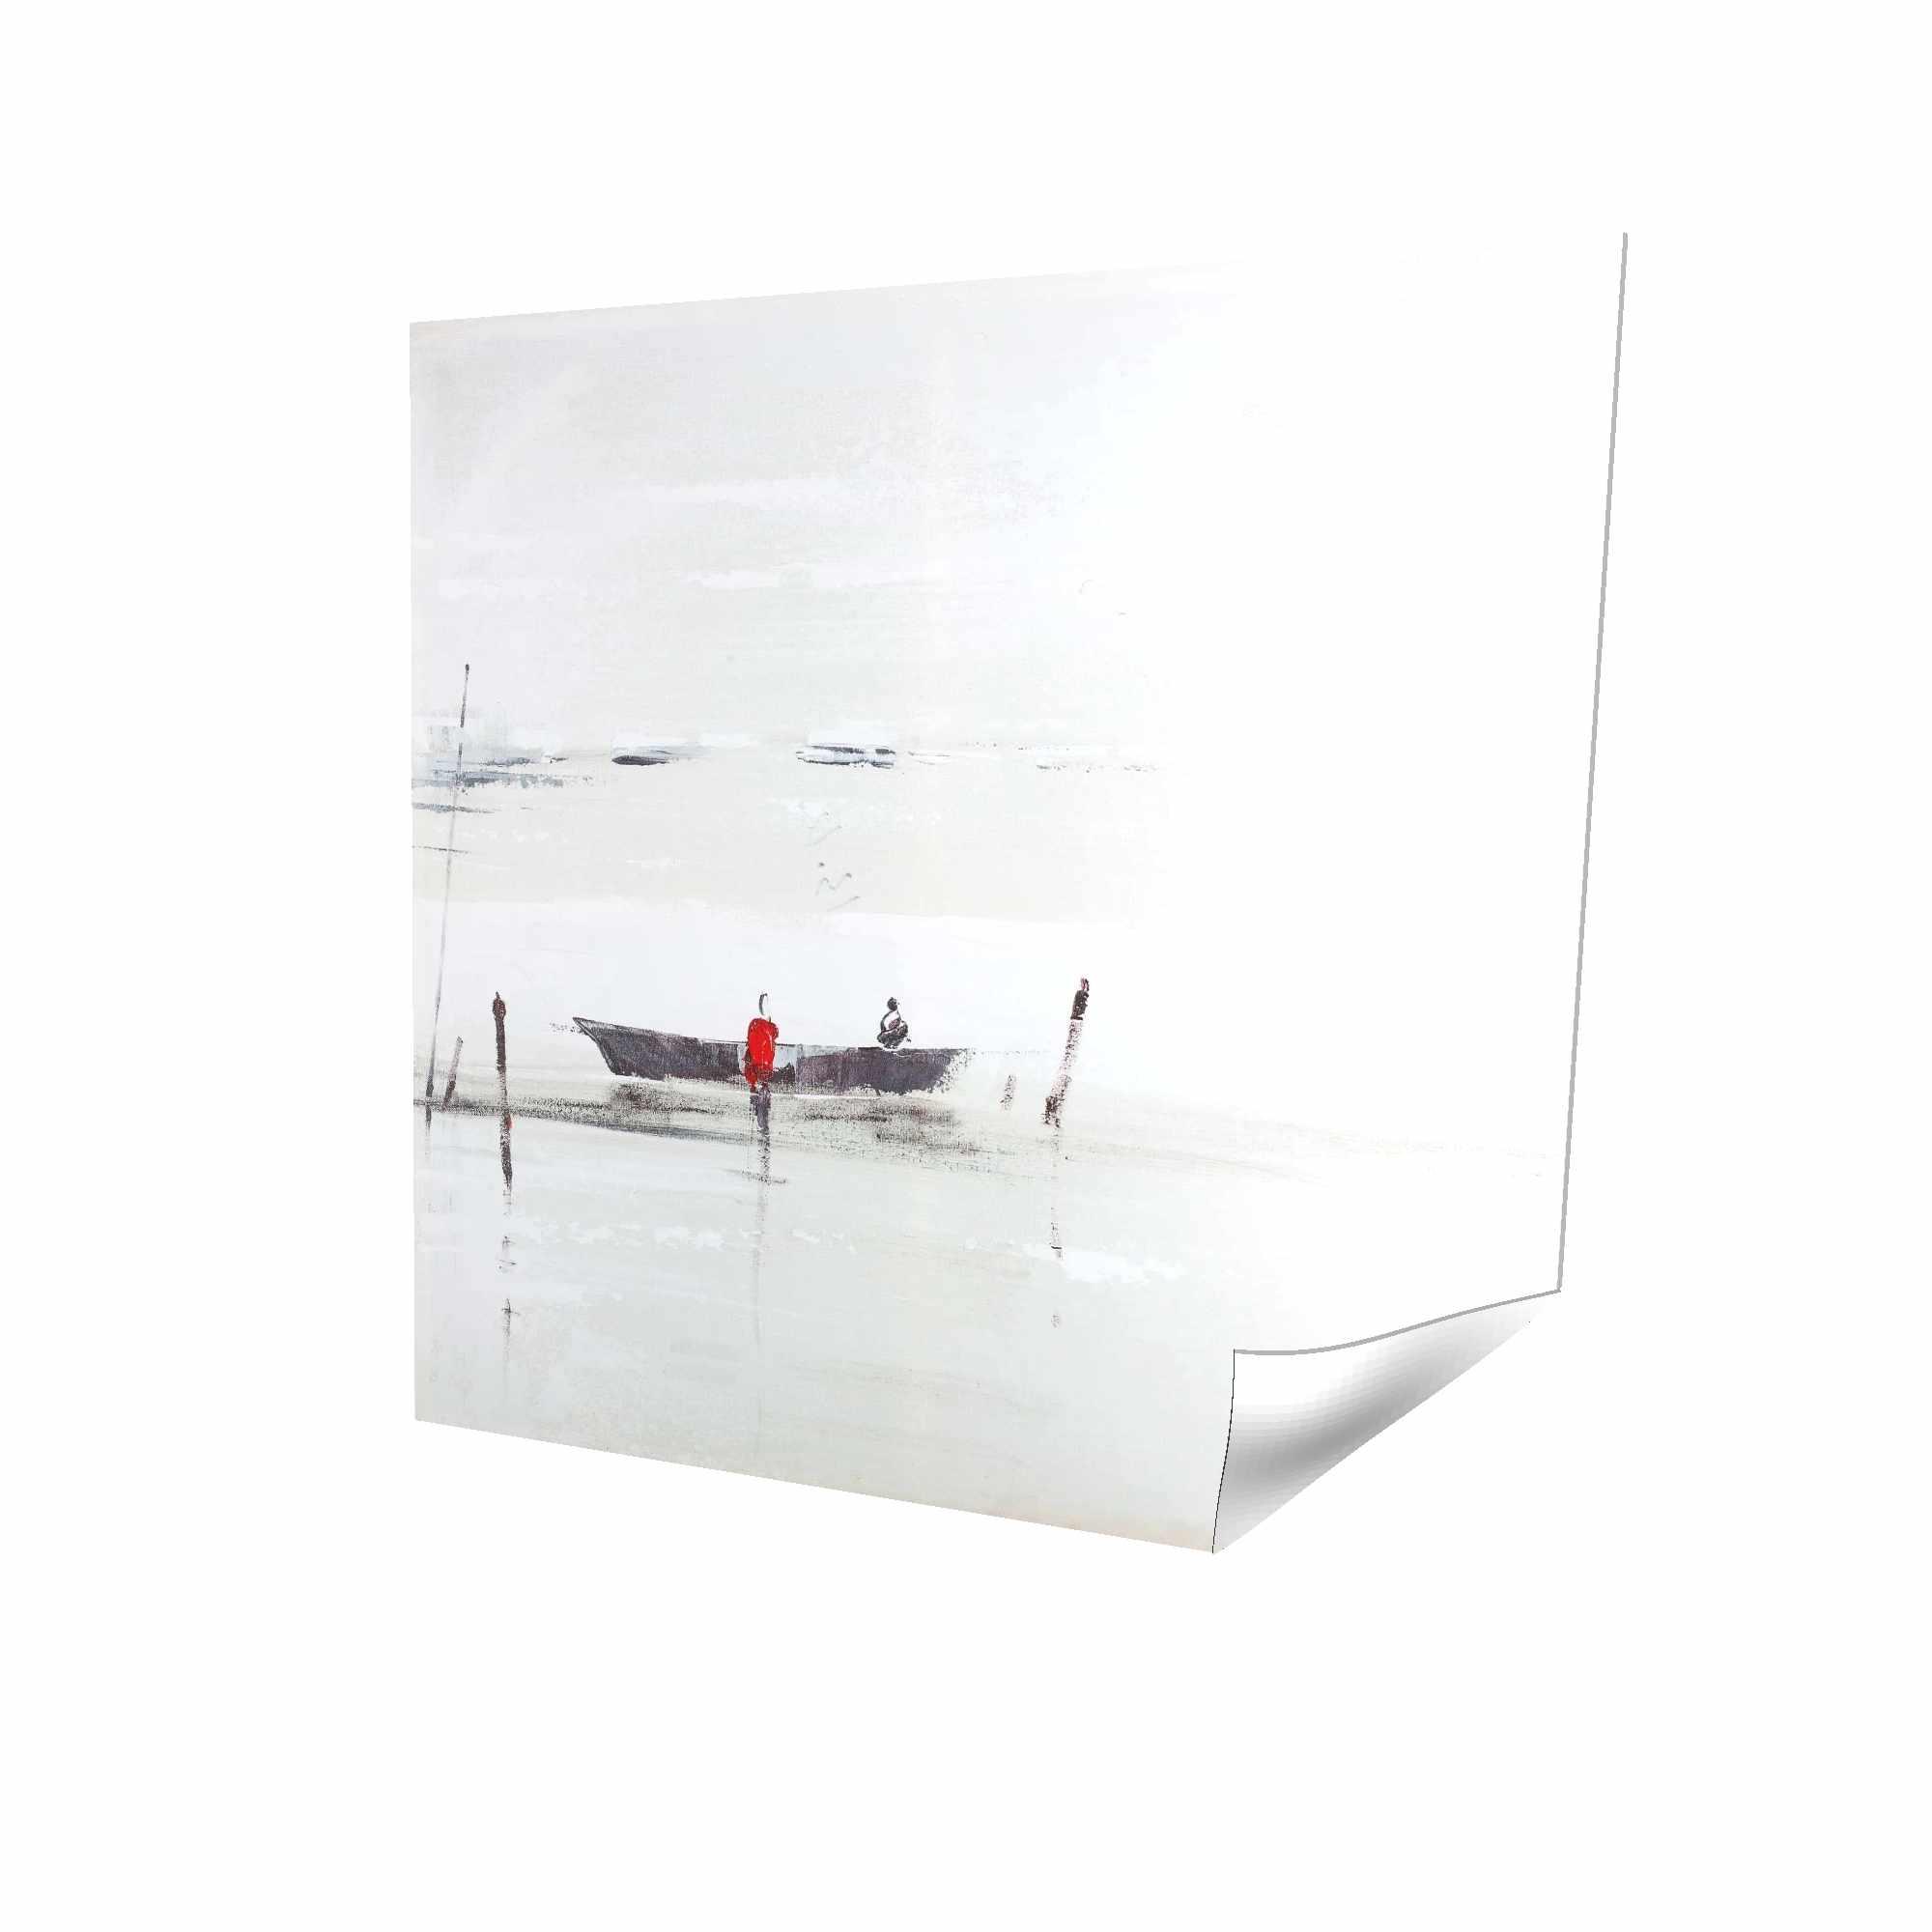 Minimalist boat on the lake